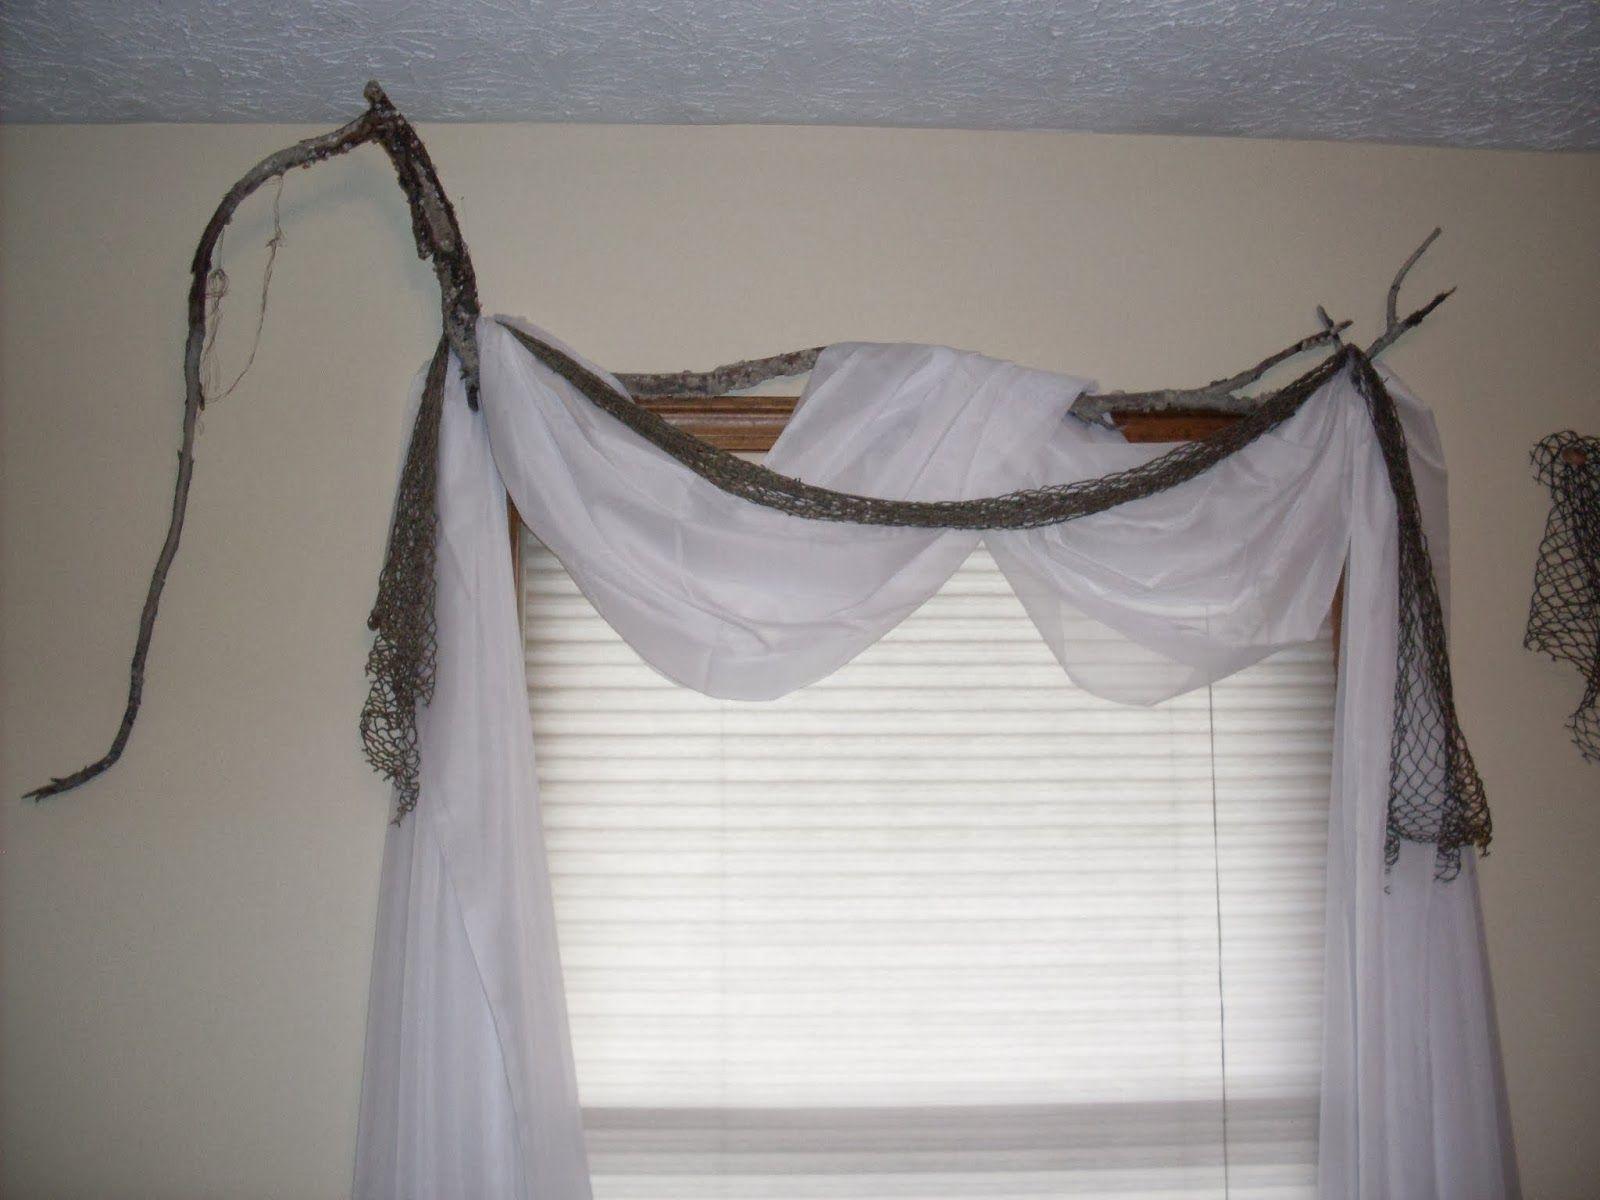 Driftwood As A Curtain Rod Curtains Curtain Rods Window Treatments